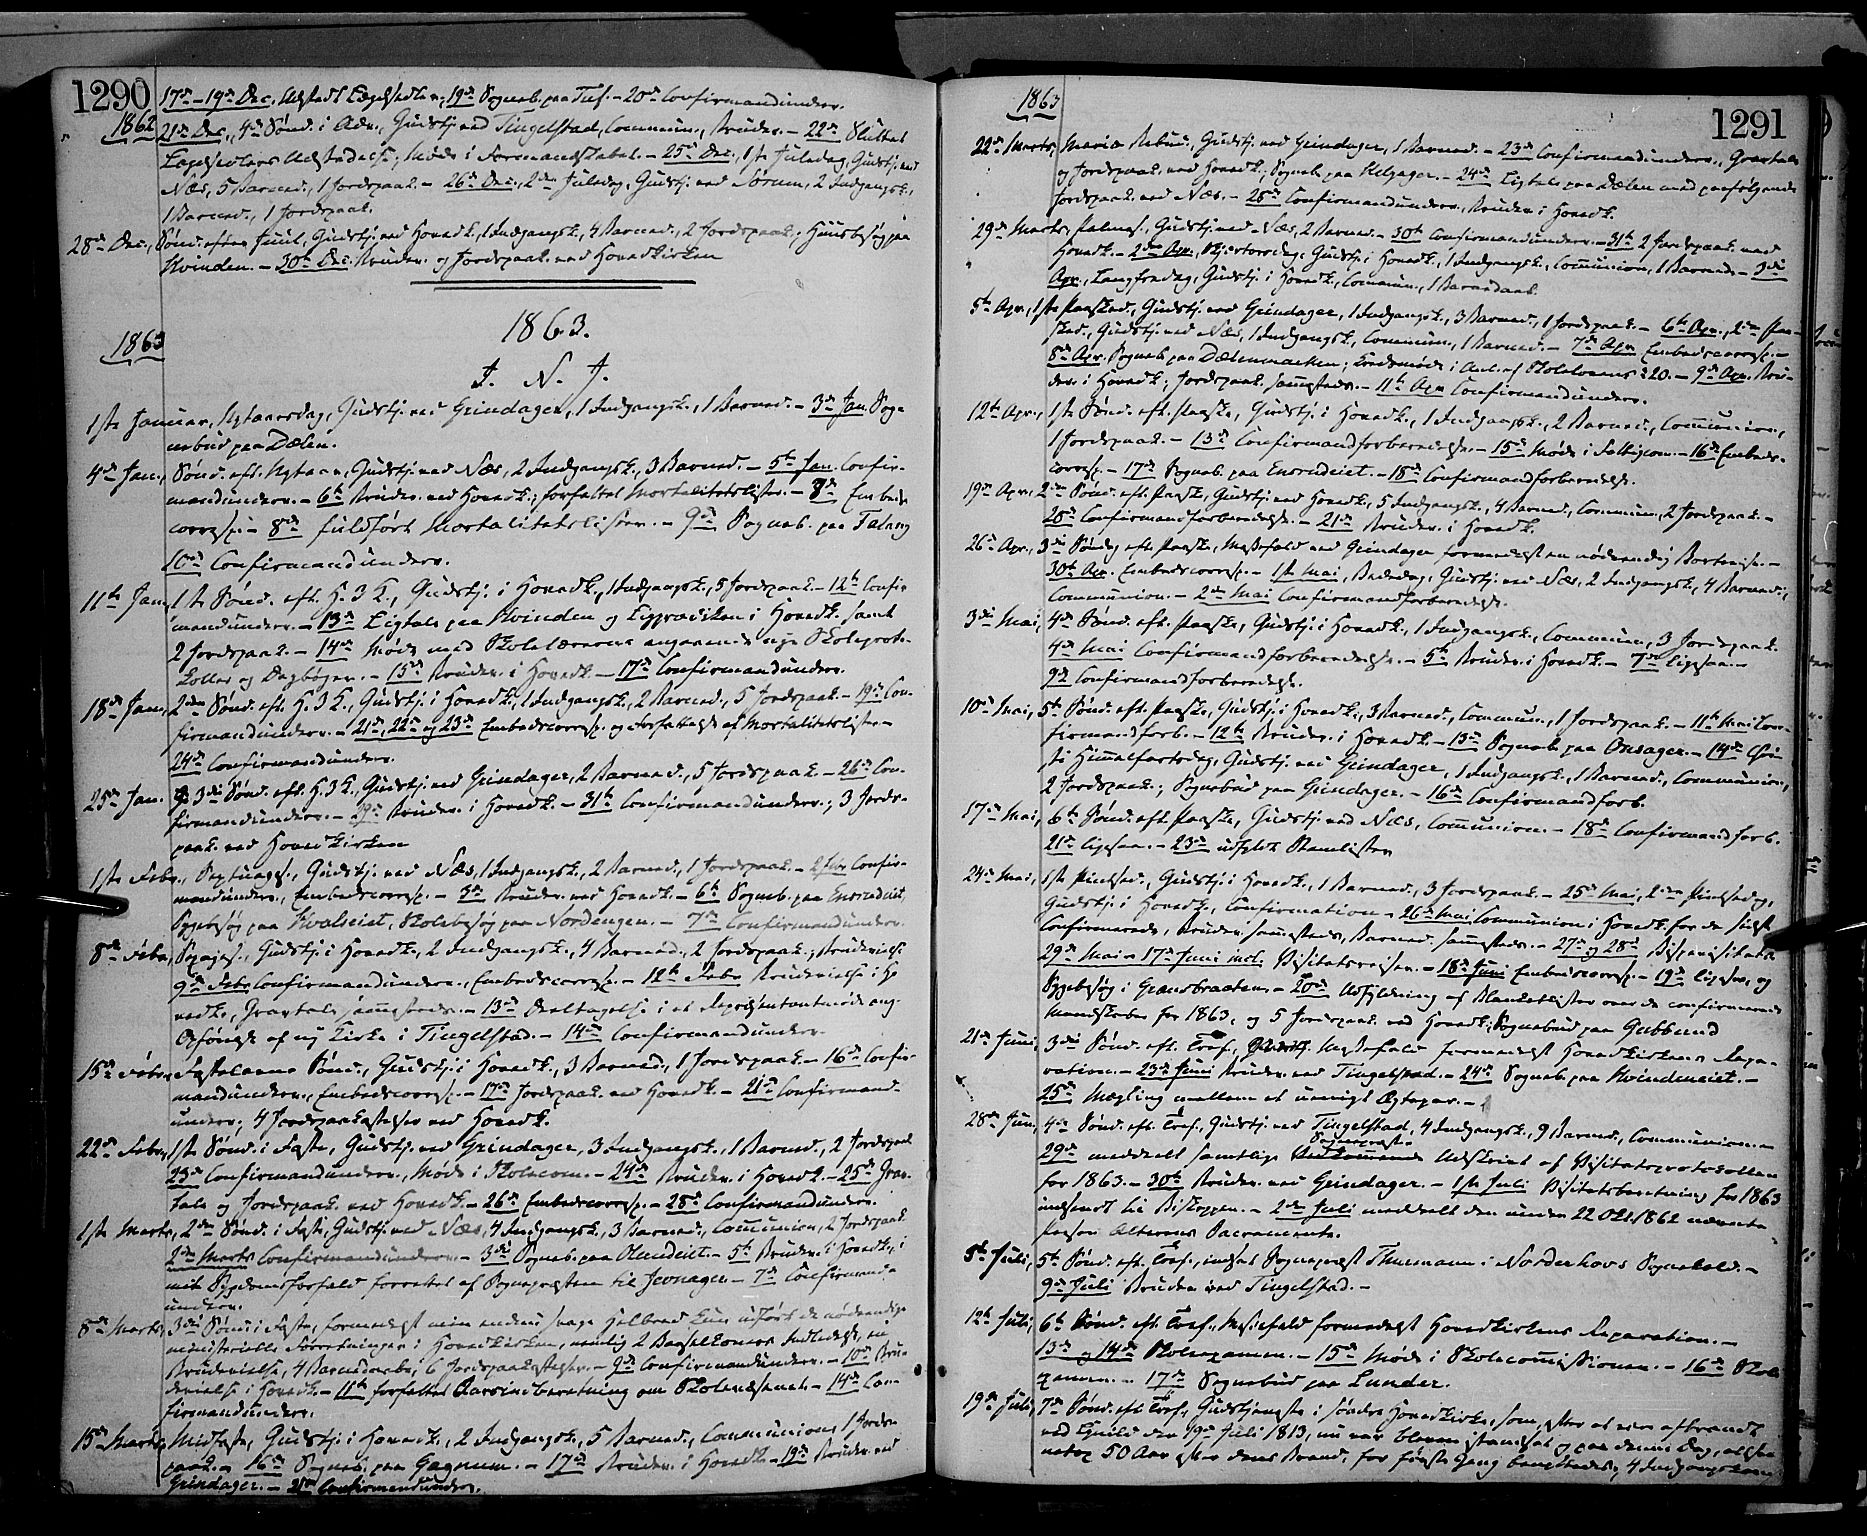 SAH, Gran prestekontor, Ministerialbok nr. 12, 1856-1874, s. 1290-1291